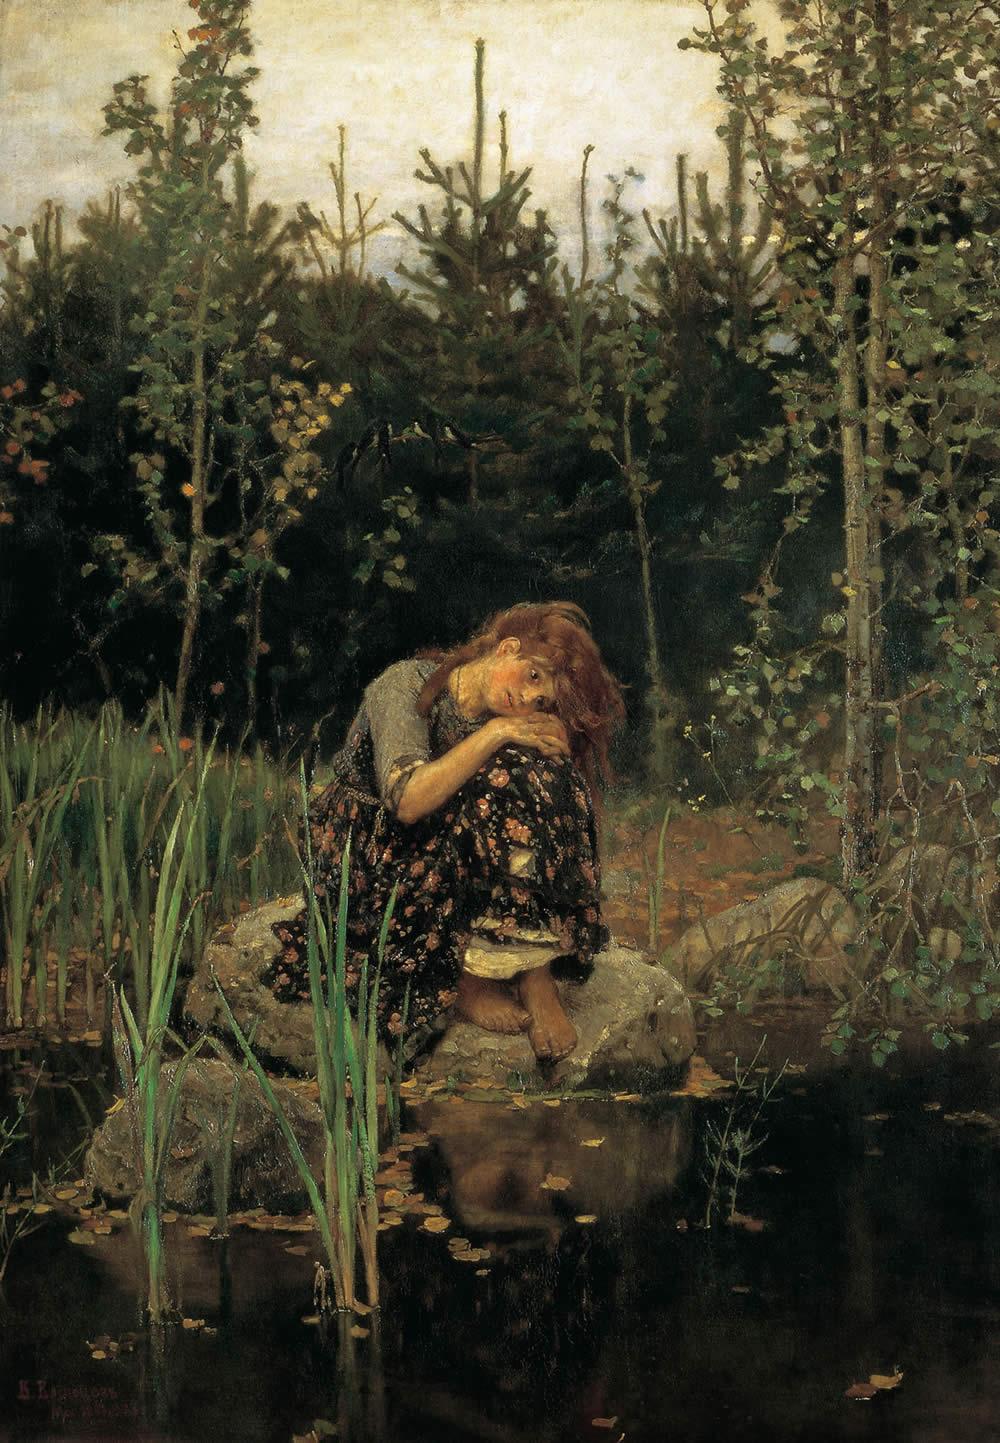 Картина «Аленушка» работы Виктора Васнецова